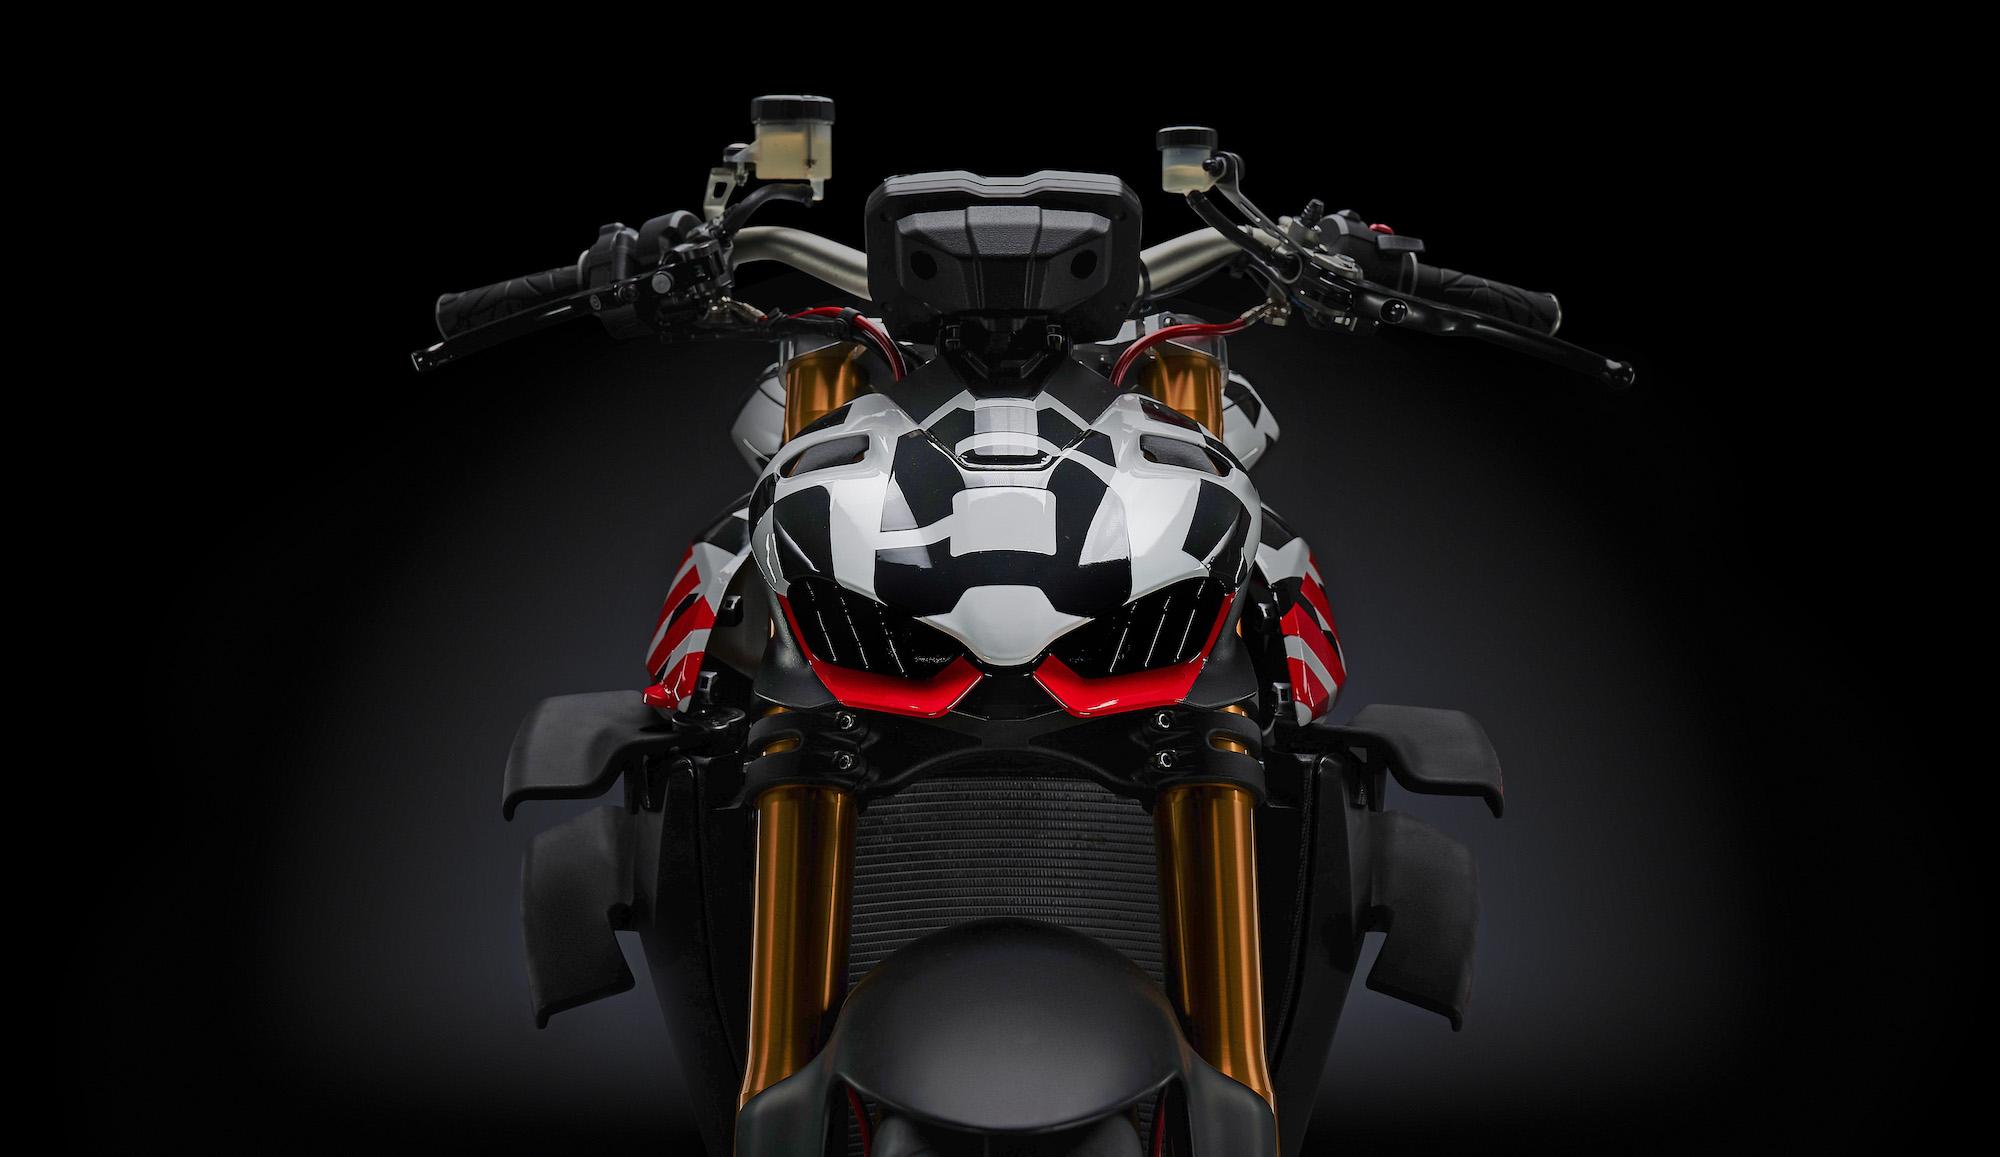 Ducati Streetfighter V4; agárrate, que vienen curvas